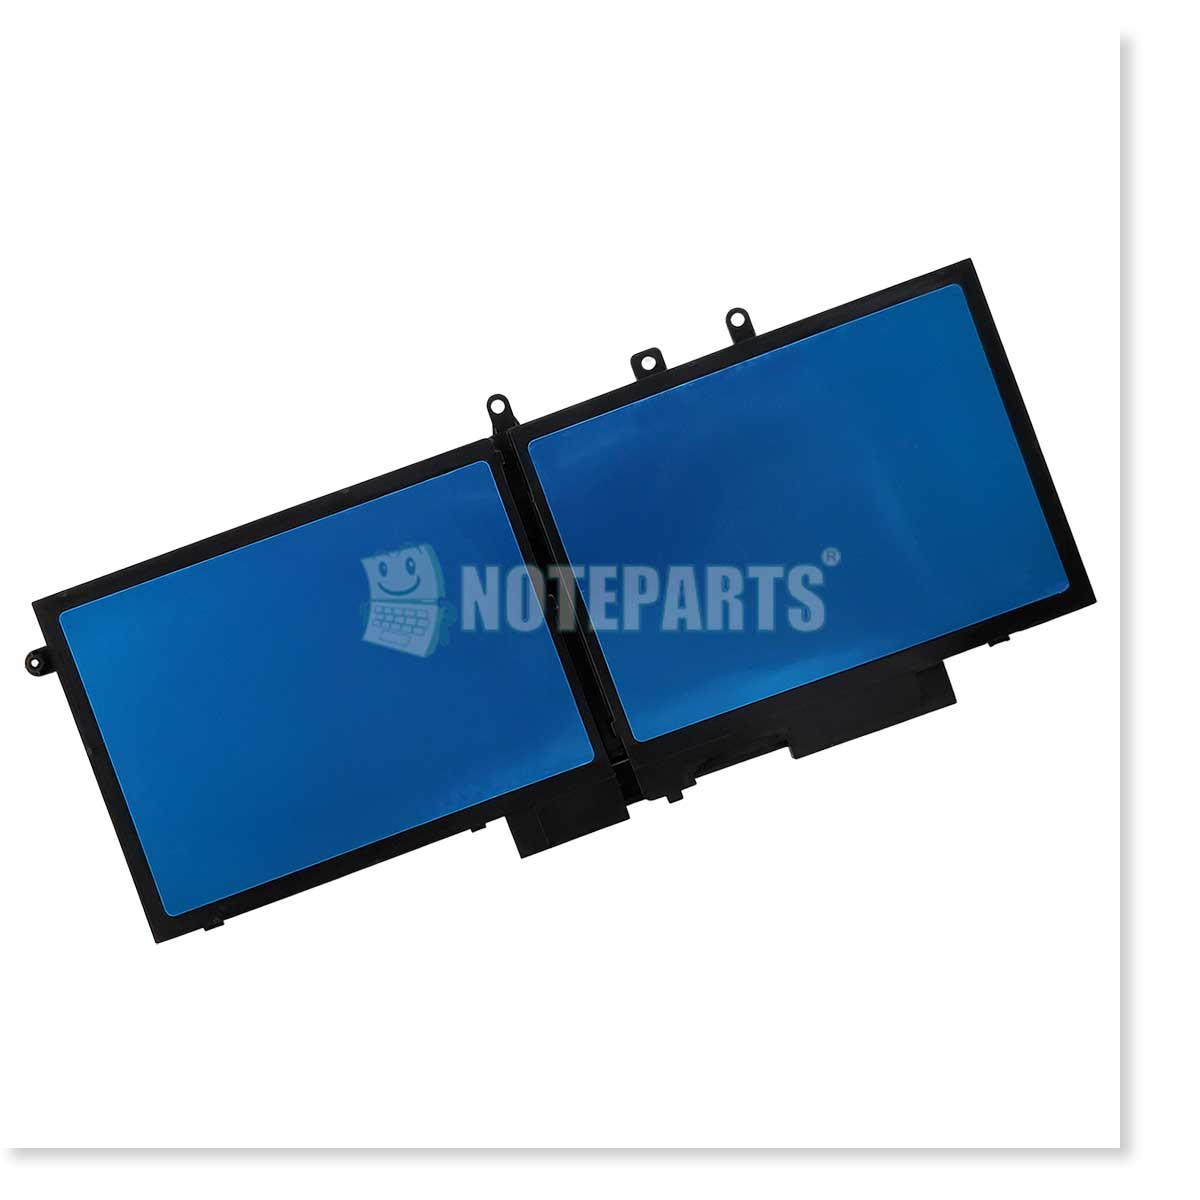 Dell デル Latitude 5480 5490 5580 5590 Precision 3520 バッテリー GJKNX GD1JP DY9NT 5YHR4対応